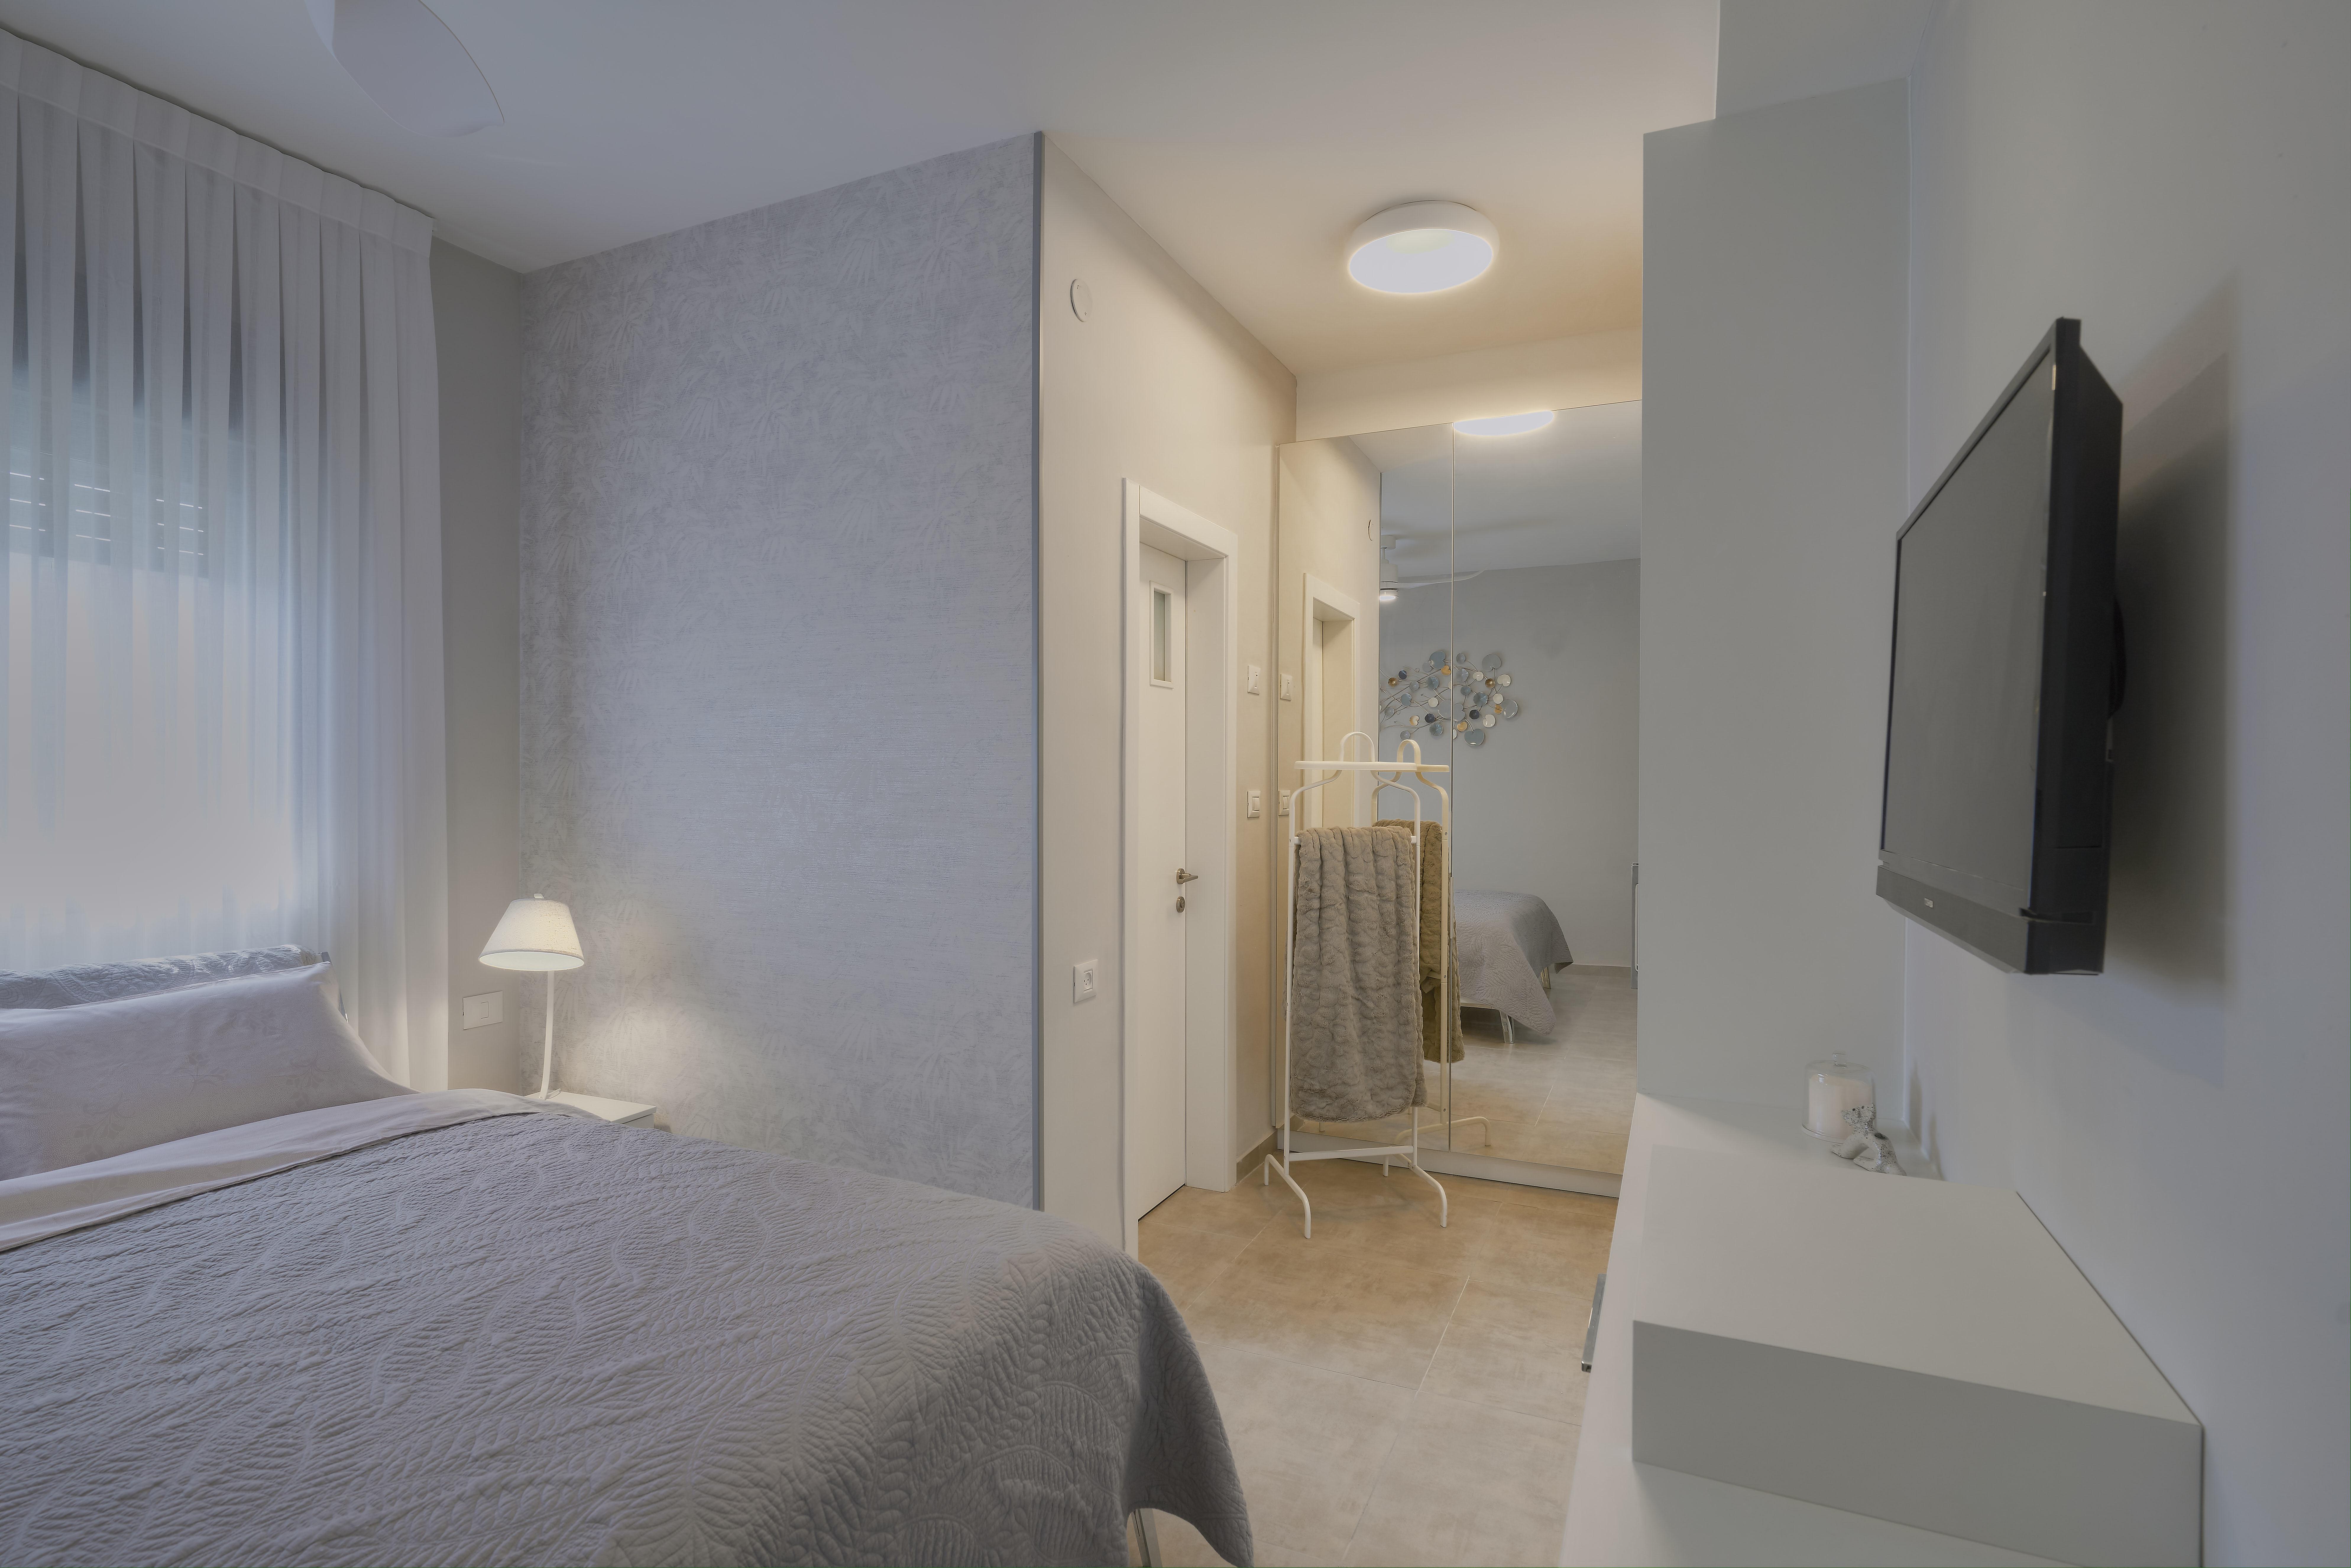 Wardrobe in Bedroom, עיצוב ארונות בחדר שינה